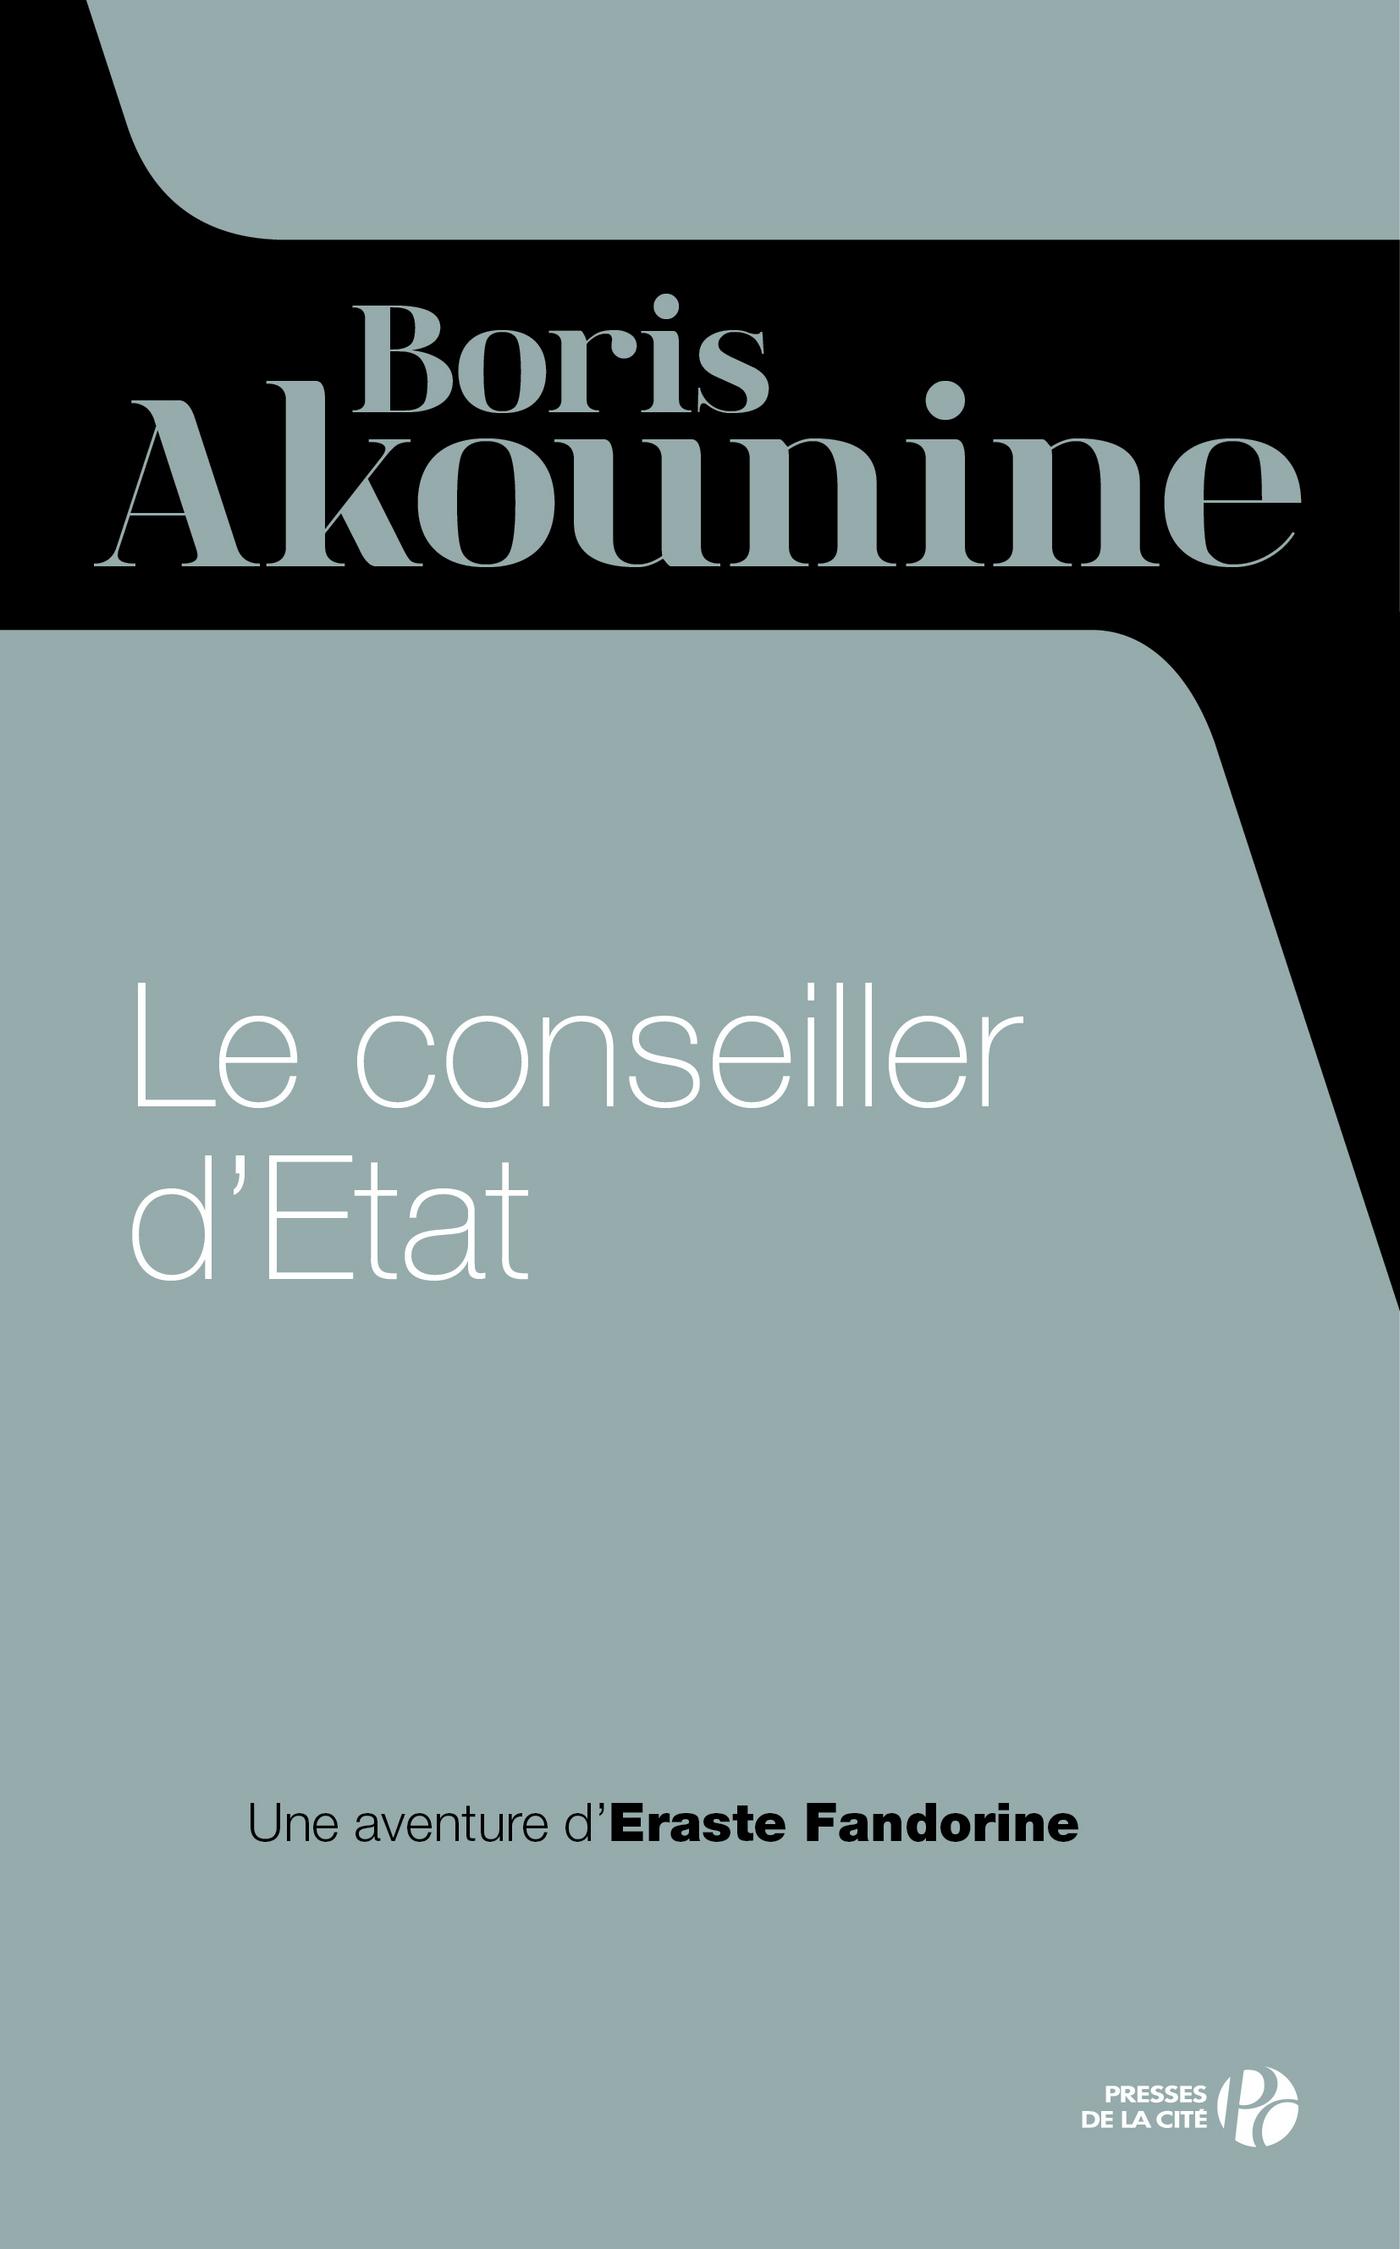 Le conseiller d'état (ebook)